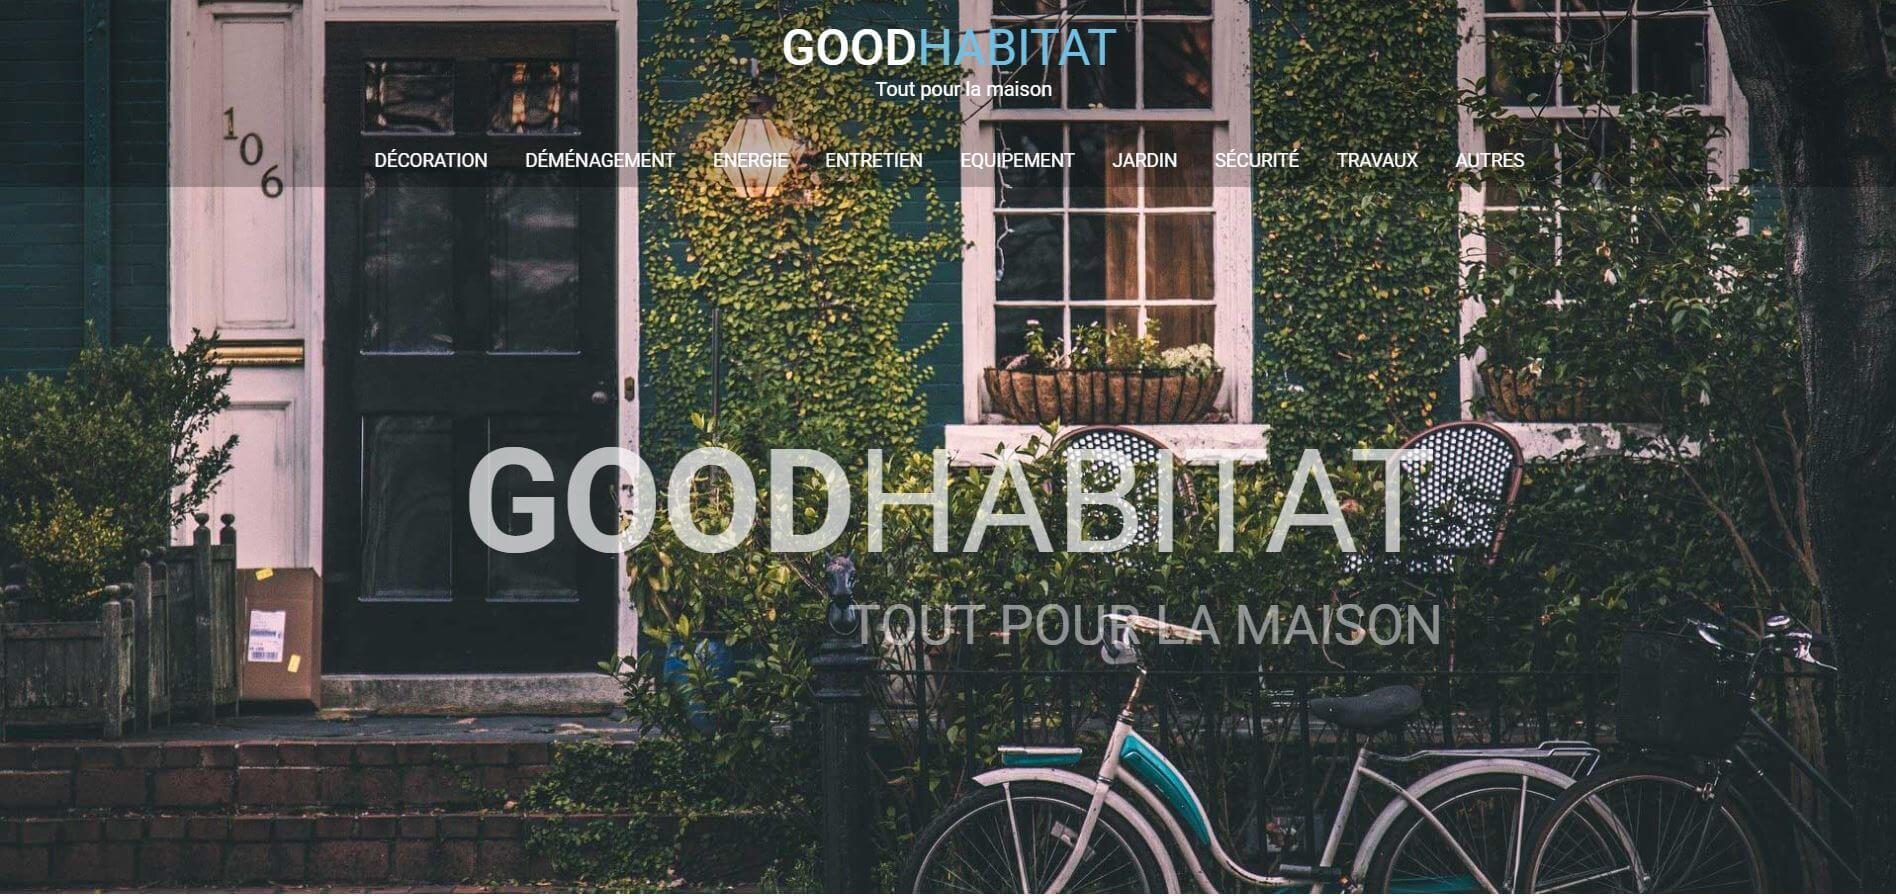 Goodhabitat Toulouse